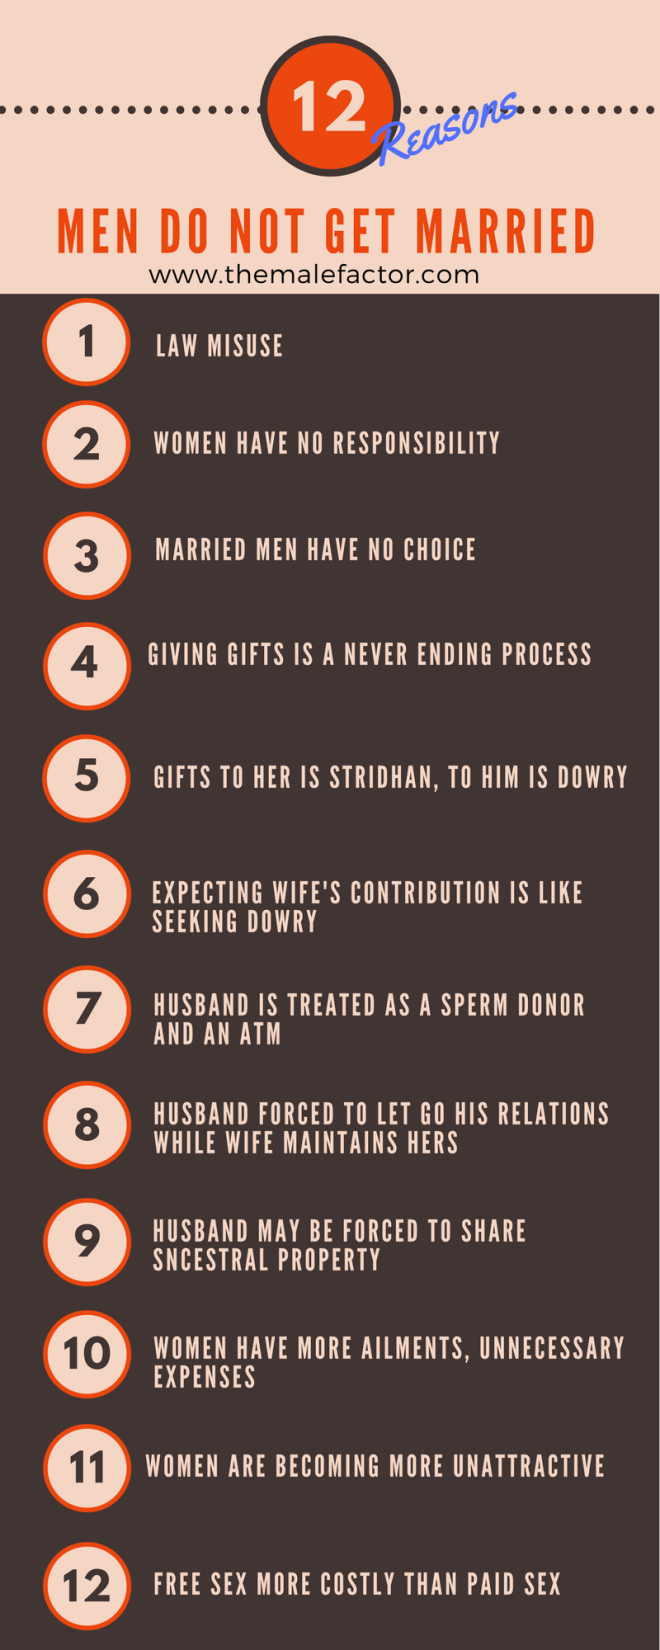 12 reasons men don't get married